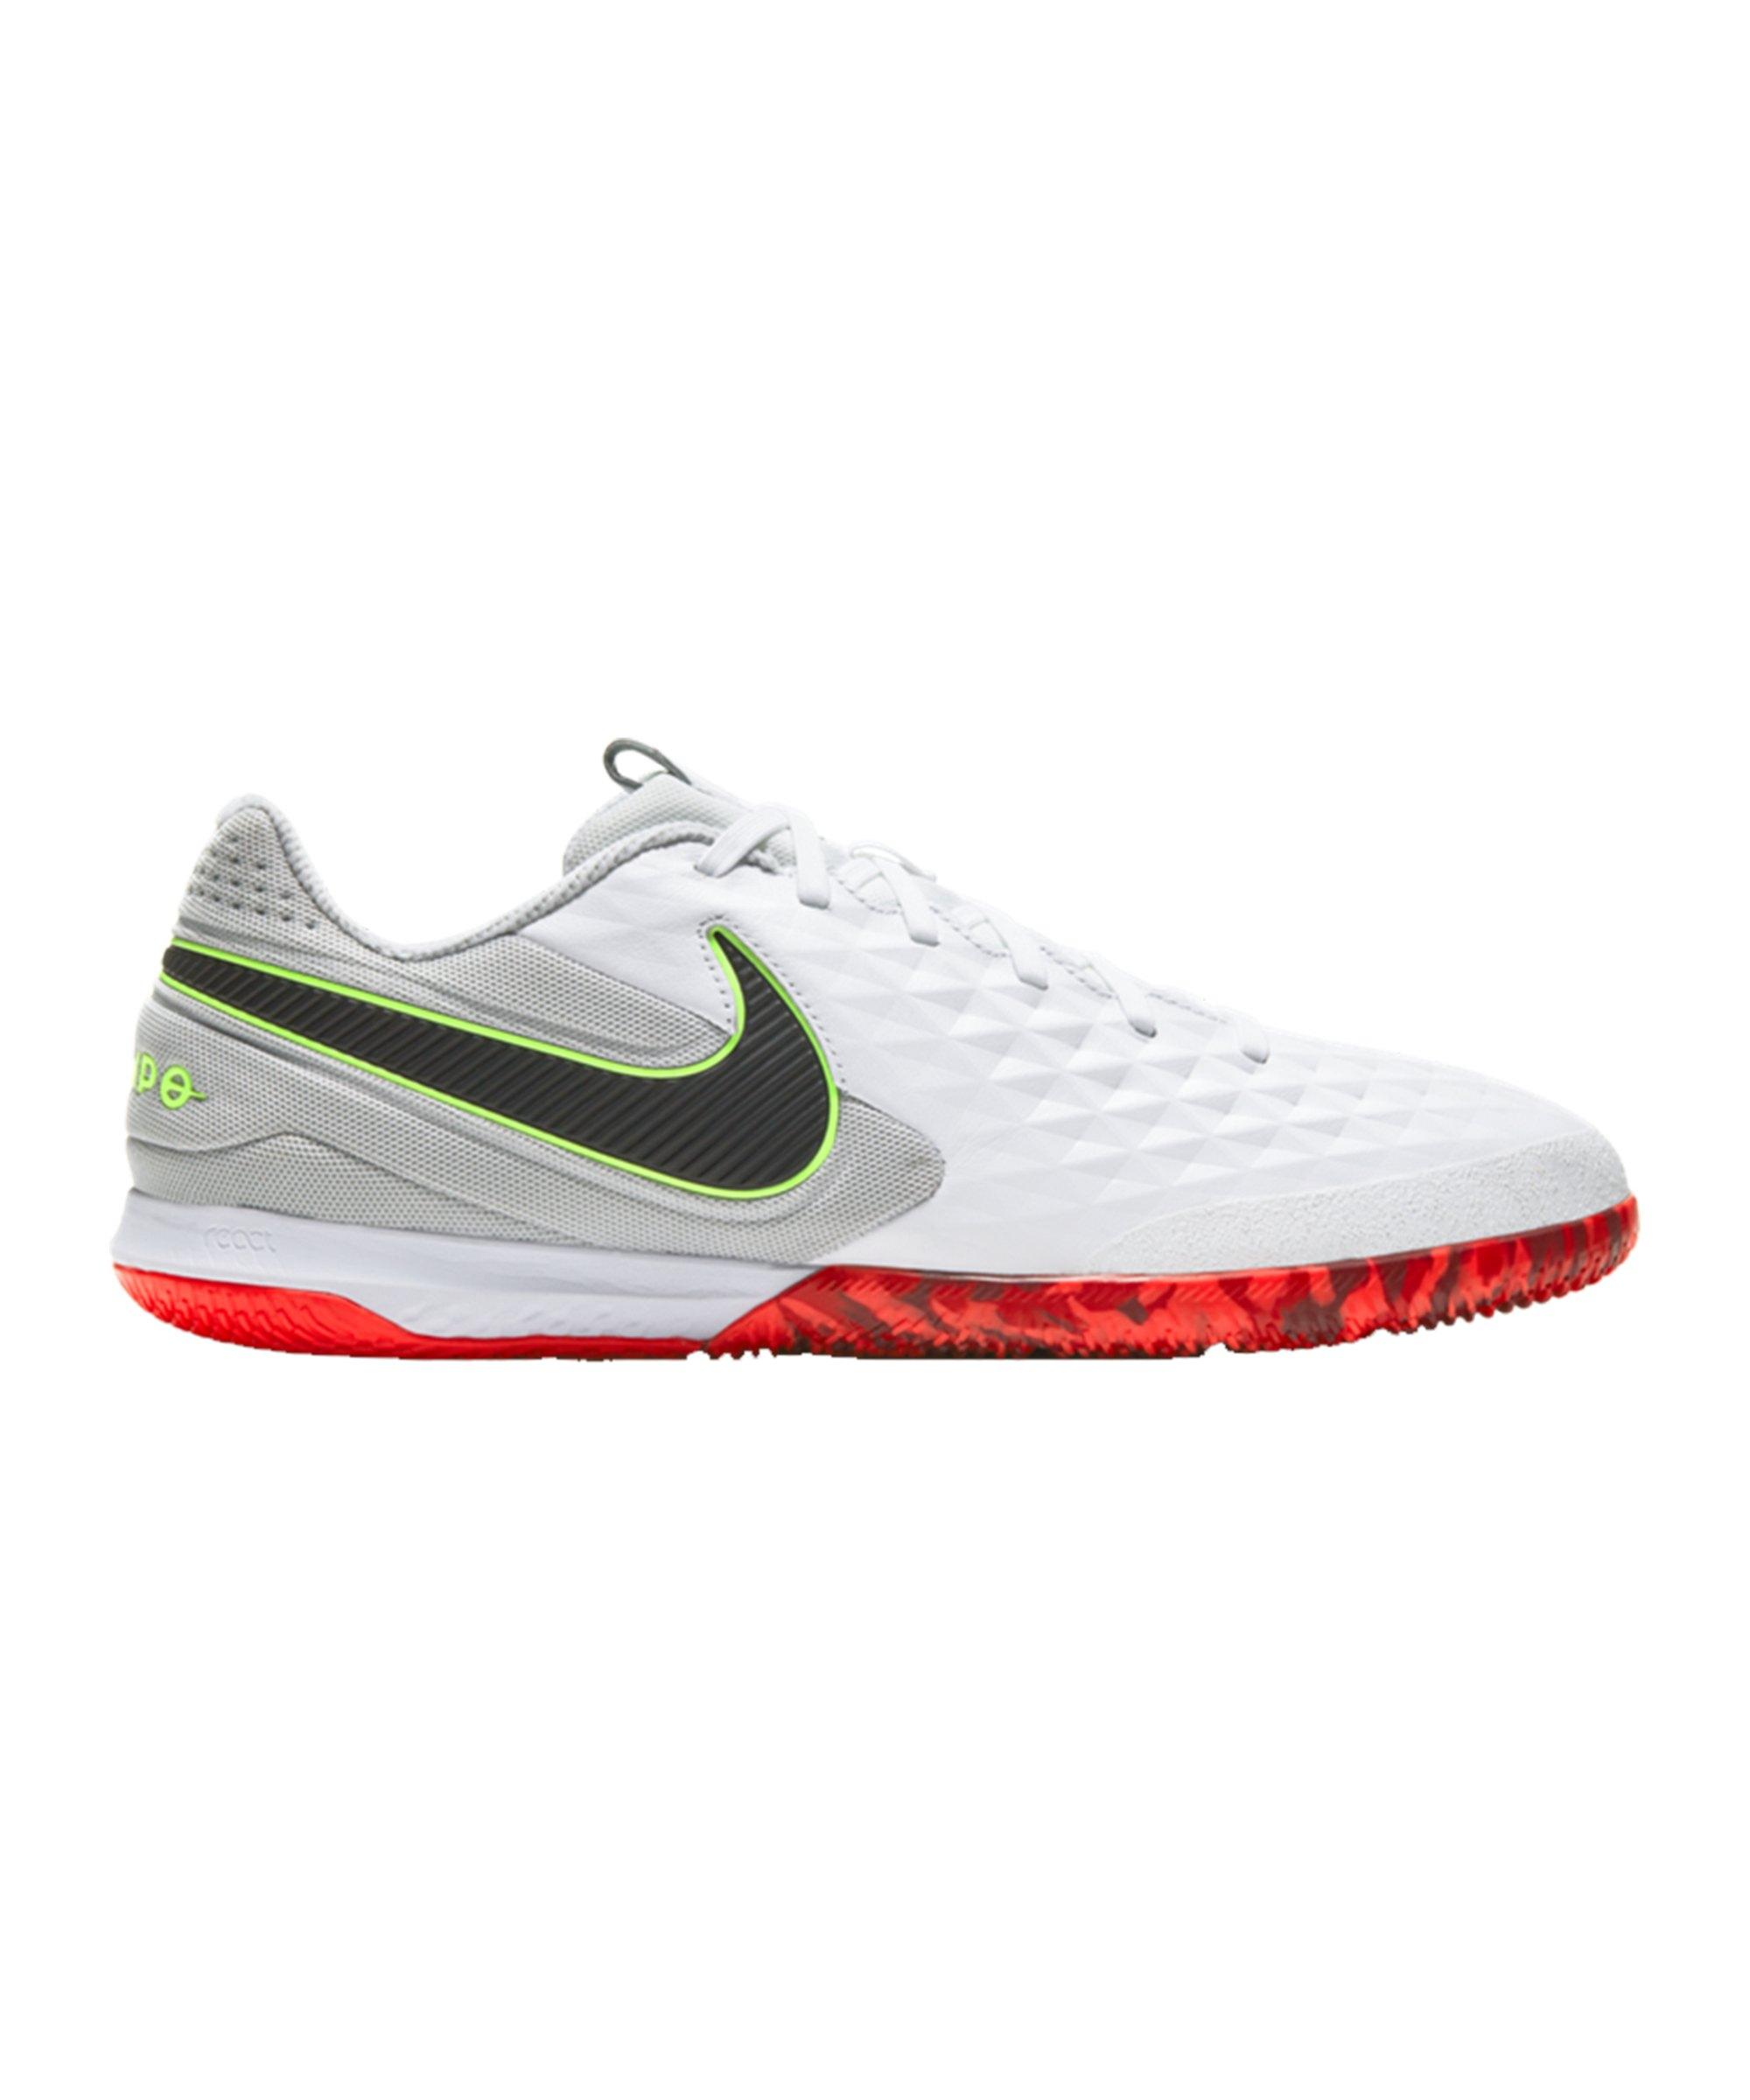 Nike Tiempo Legend VIII Pro React IC Weiss Grau Rot F106 - weiss